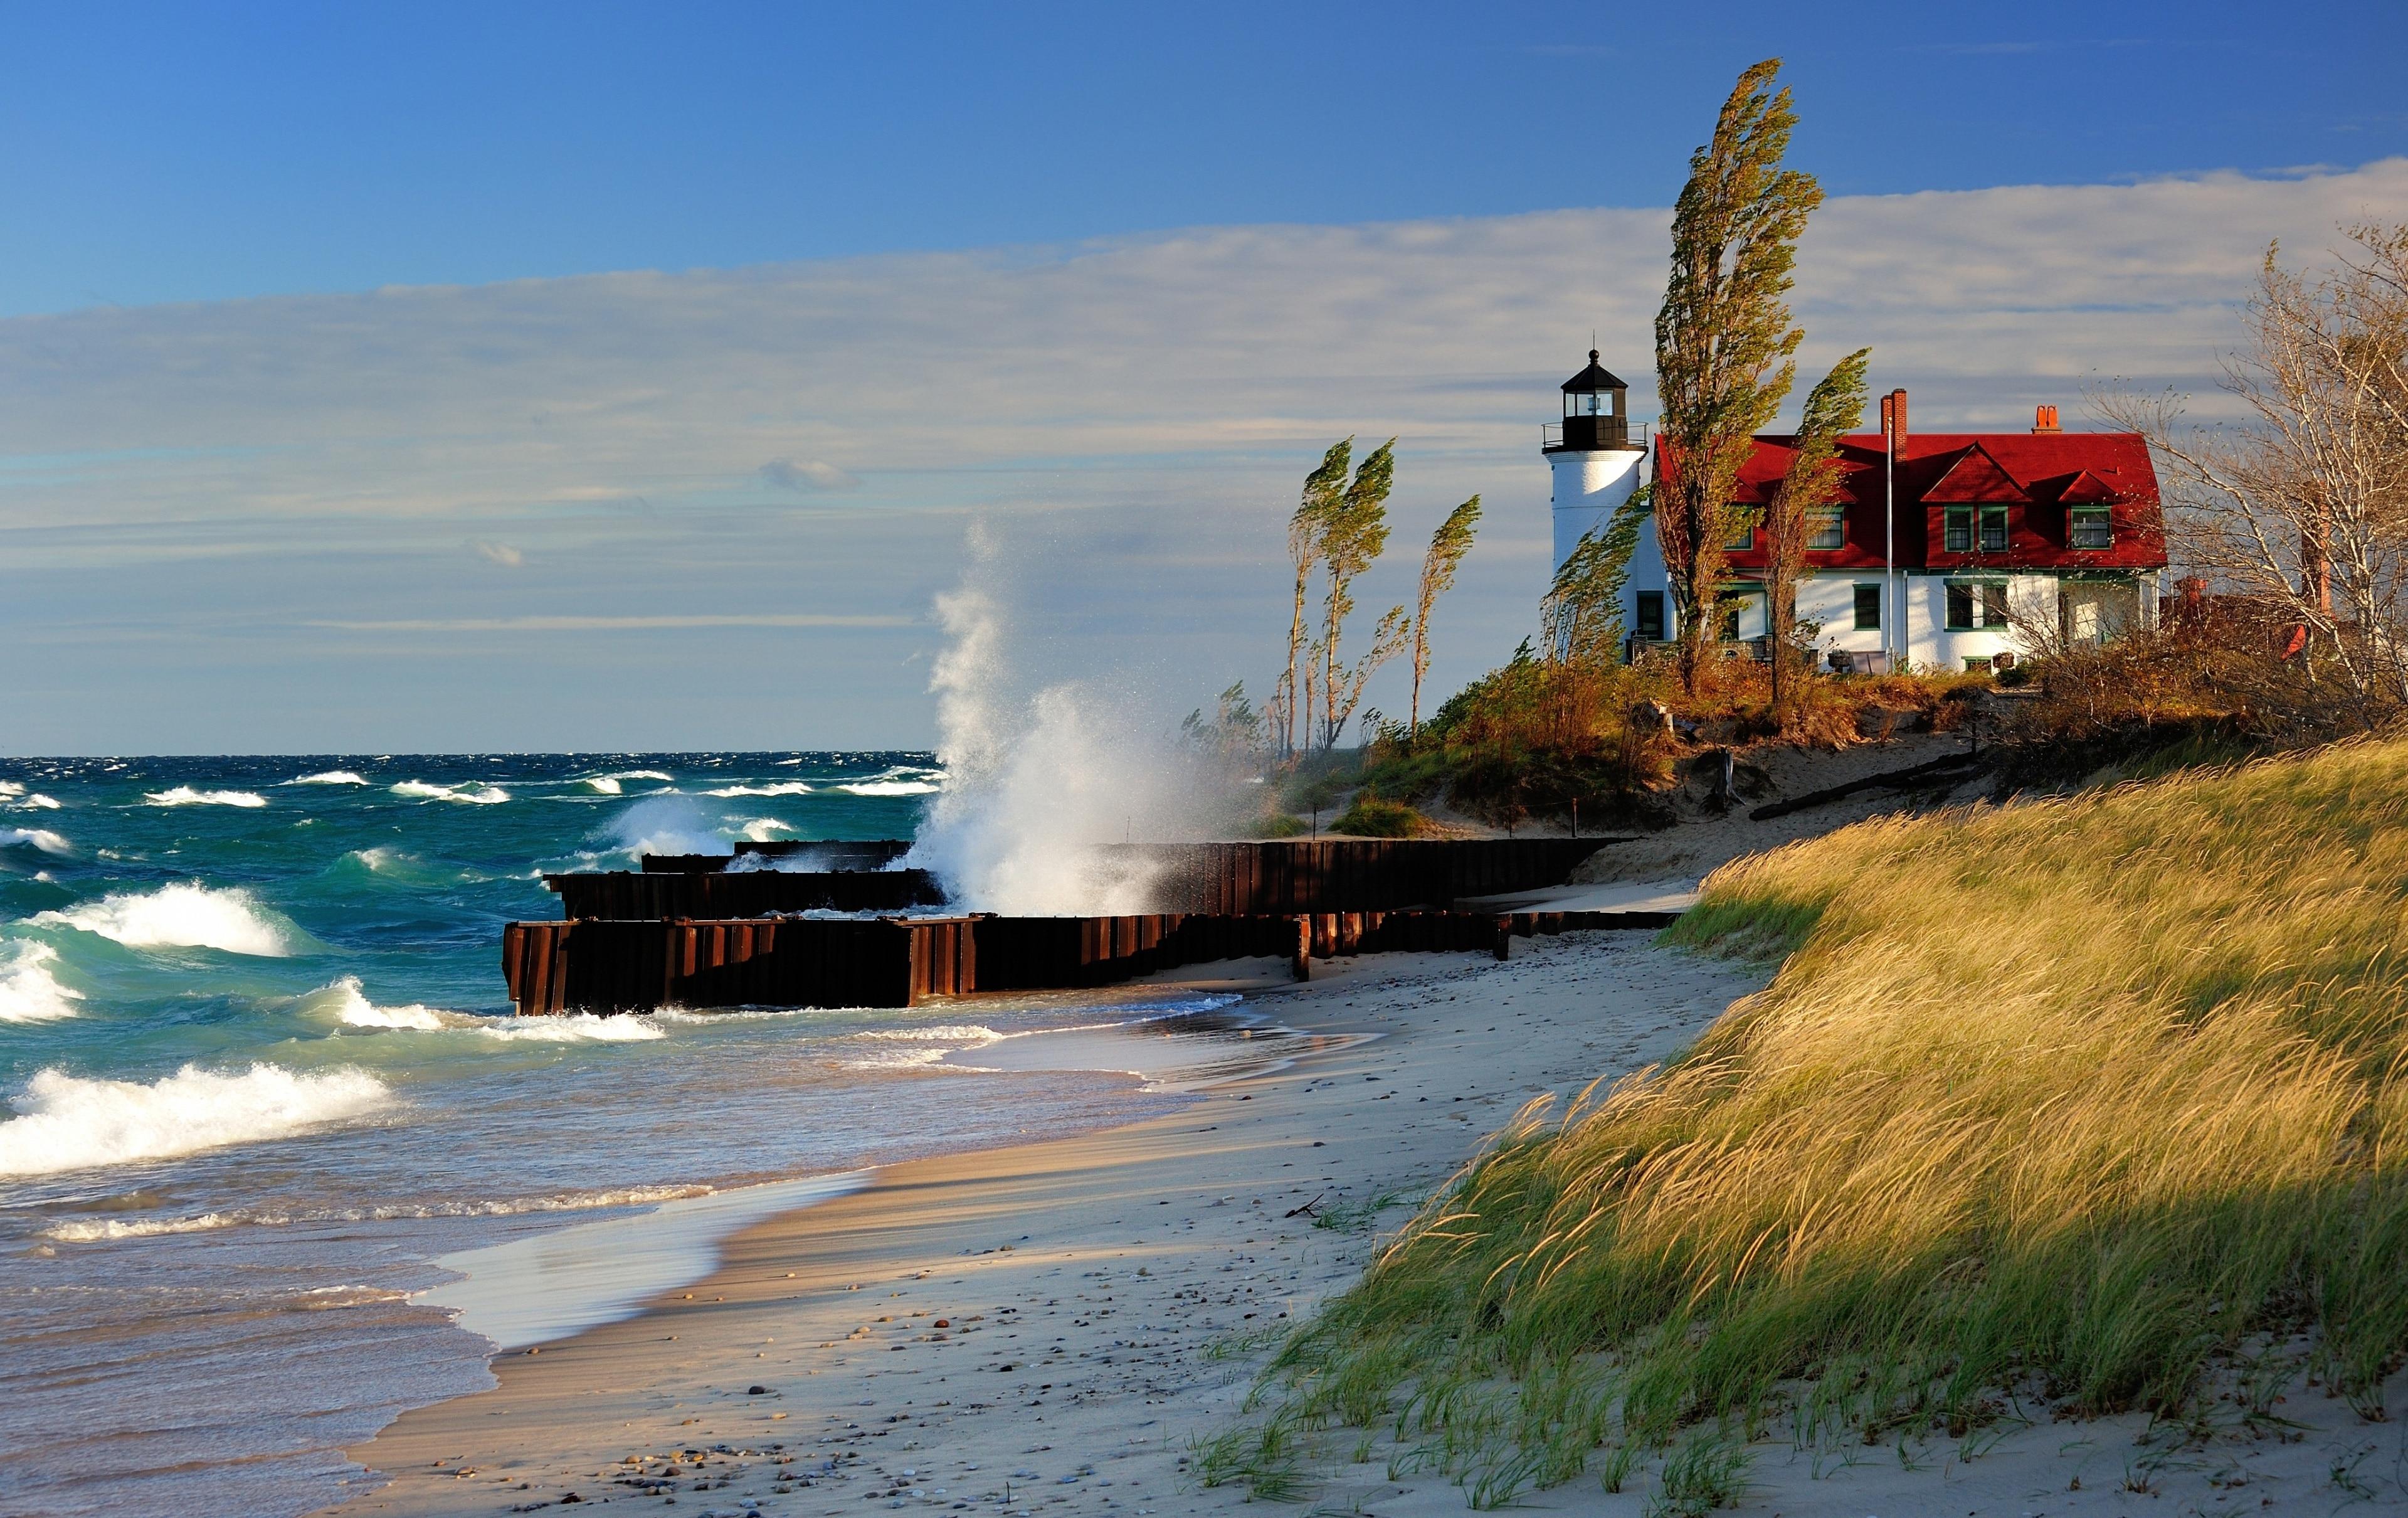 Benzie County, Michigan, United States of America